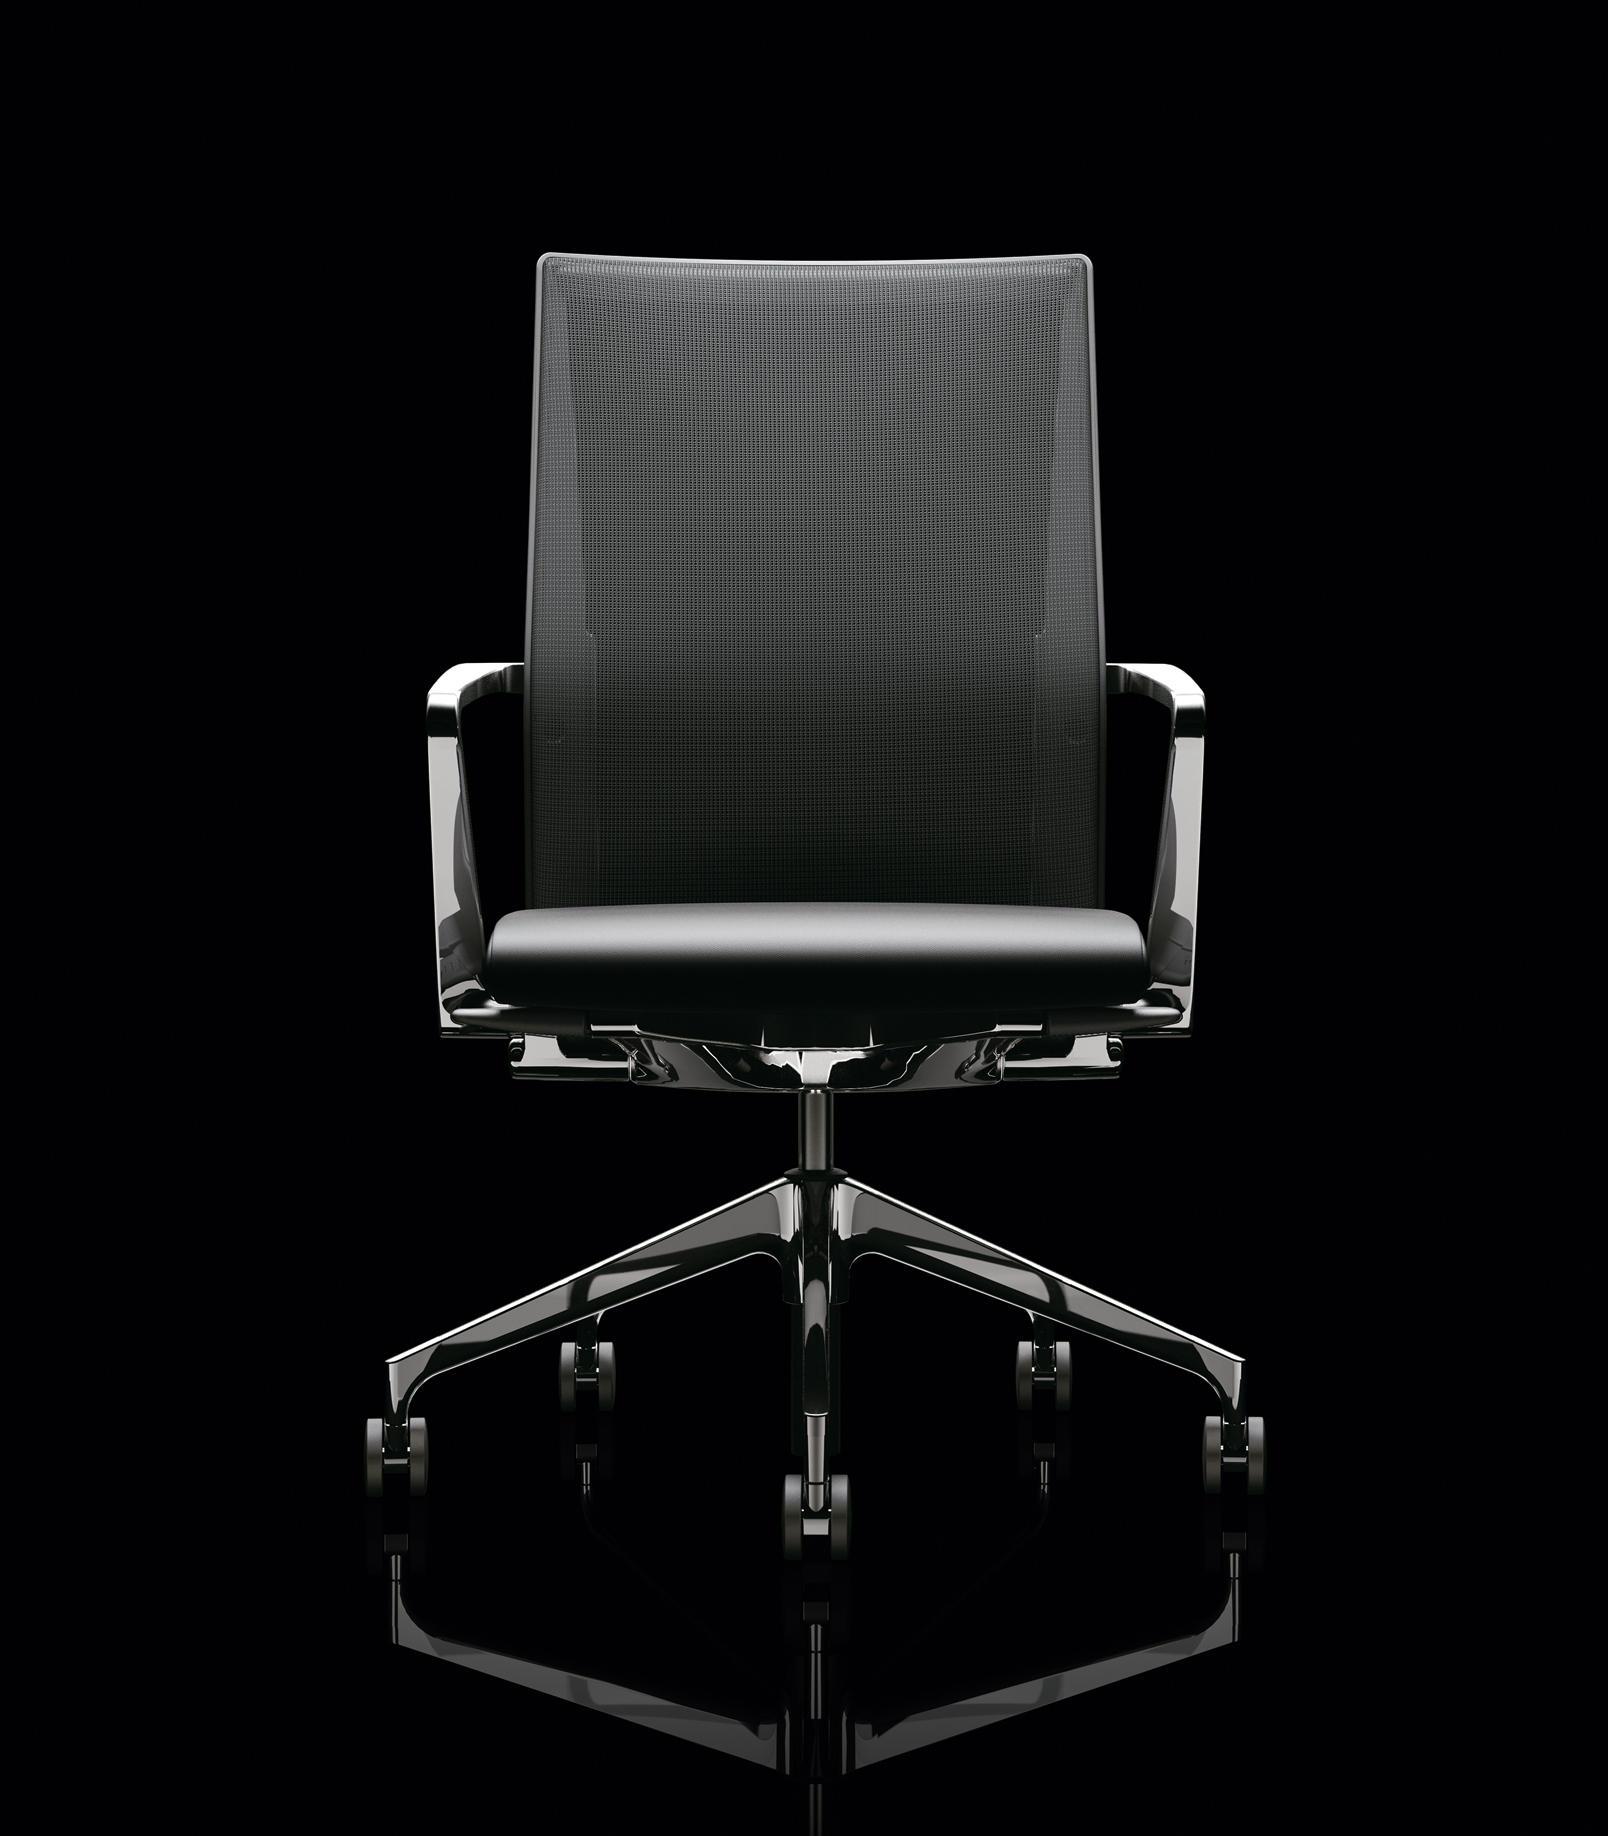 Sava Mesh Back Task Chairs From Stylex Architonic